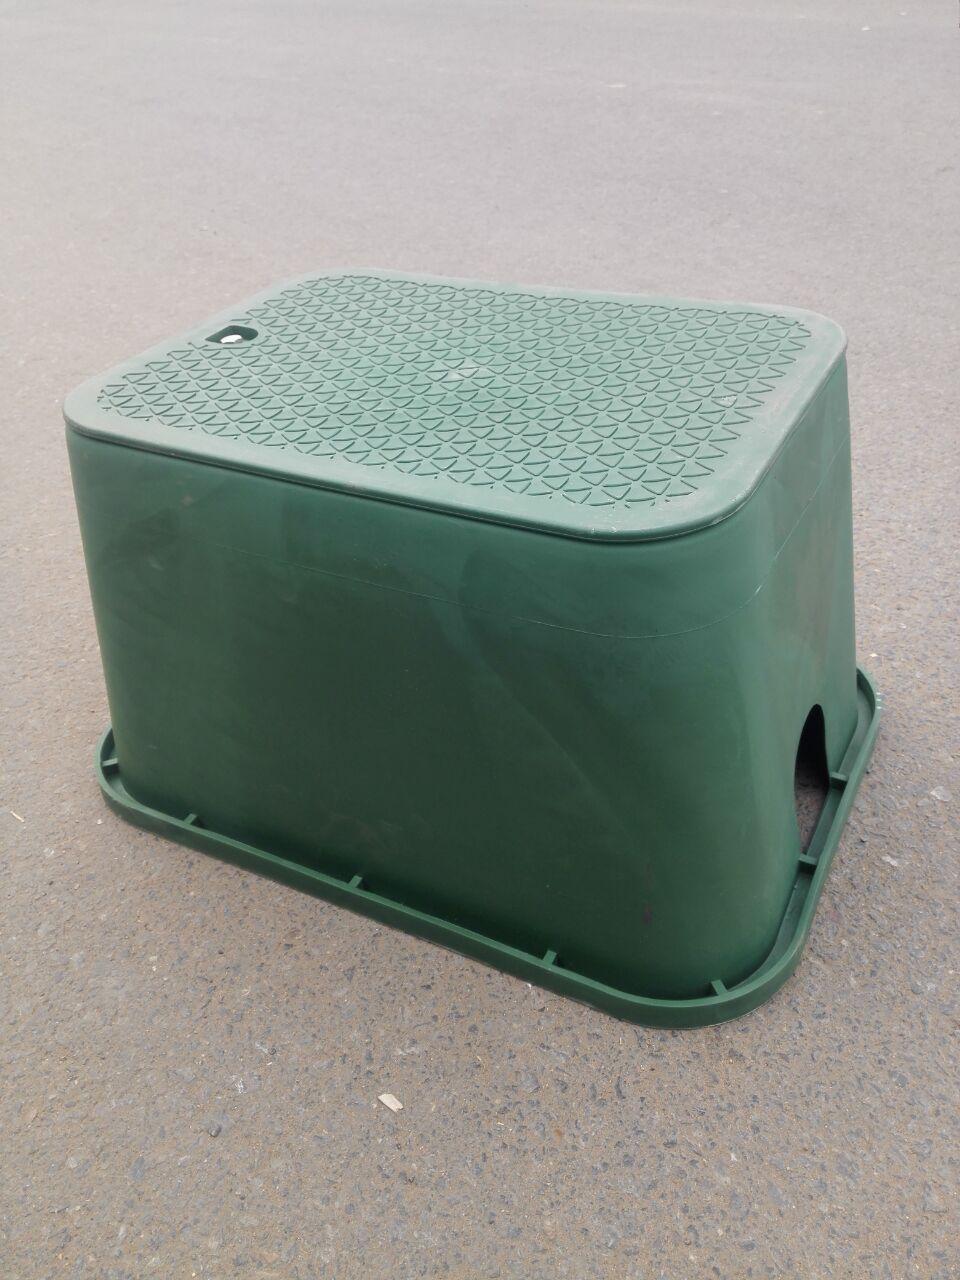 Joyous Valve Box Green Sprinkler Irrigation Plastic Valve Boxes Watervalve Valve Usd Valve Box Green Sprinkler Irrigation Plastic Sprinkler Valve Box Diagram Sprinkler Valve Box Riser houzz-02 Sprinkler Valve Box